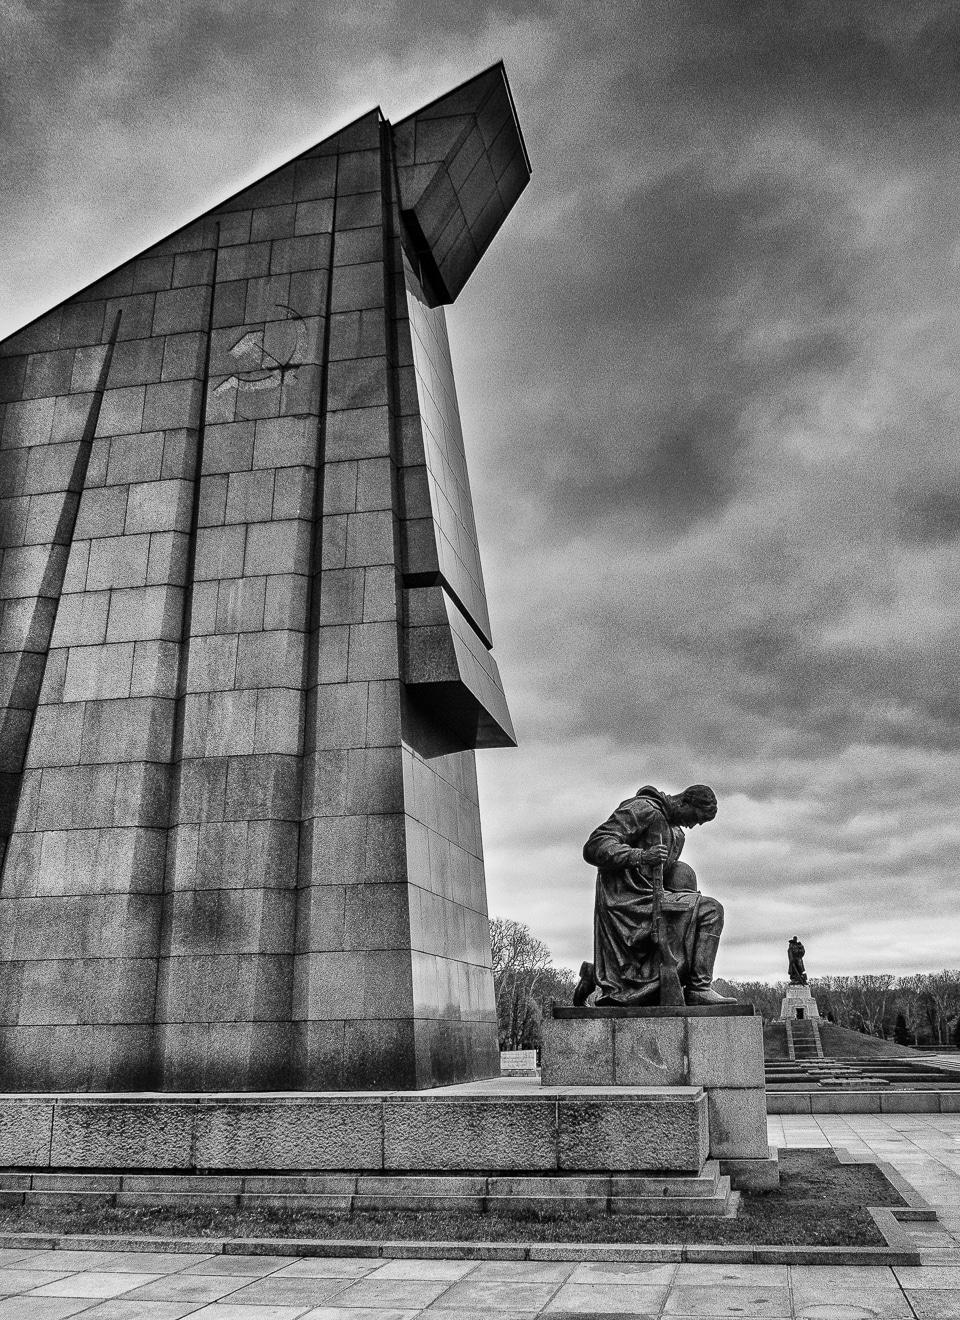 soviet world war ii memorial treptower park berlin travel past 50. Black Bedroom Furniture Sets. Home Design Ideas